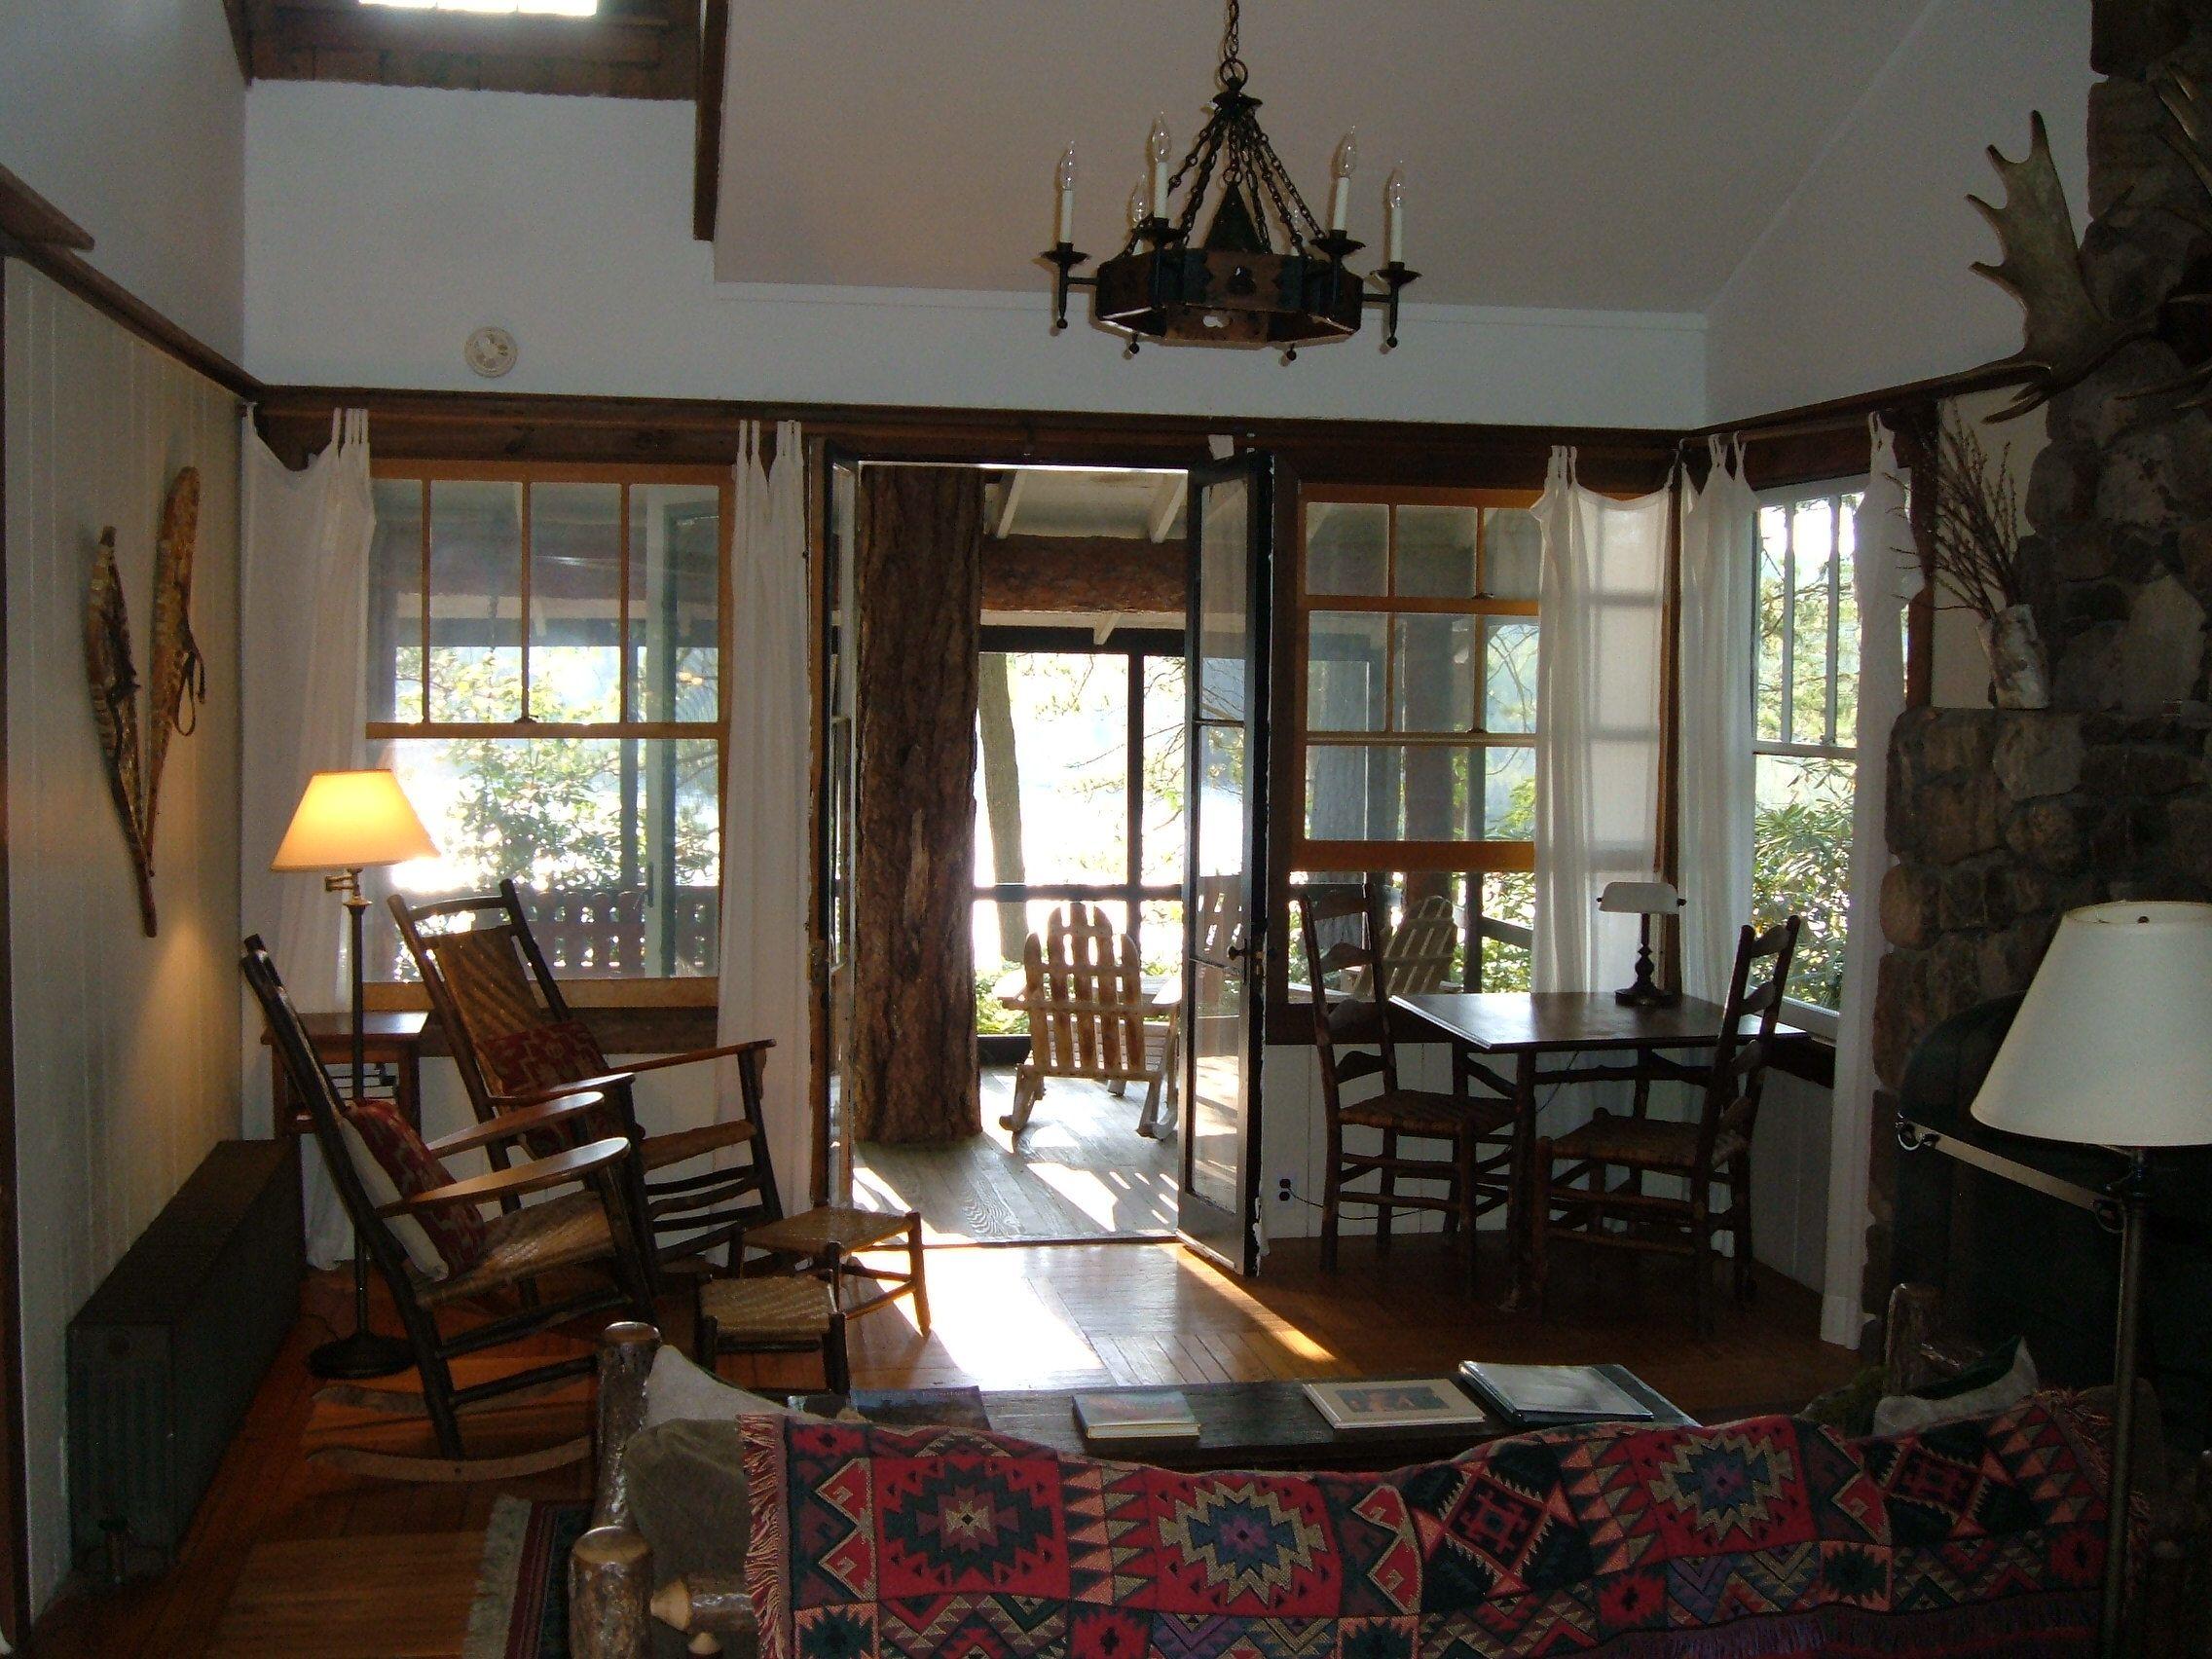 rentals luxury broken pin cabins adirondacks oklahoma log cabin bow lakefront adventures